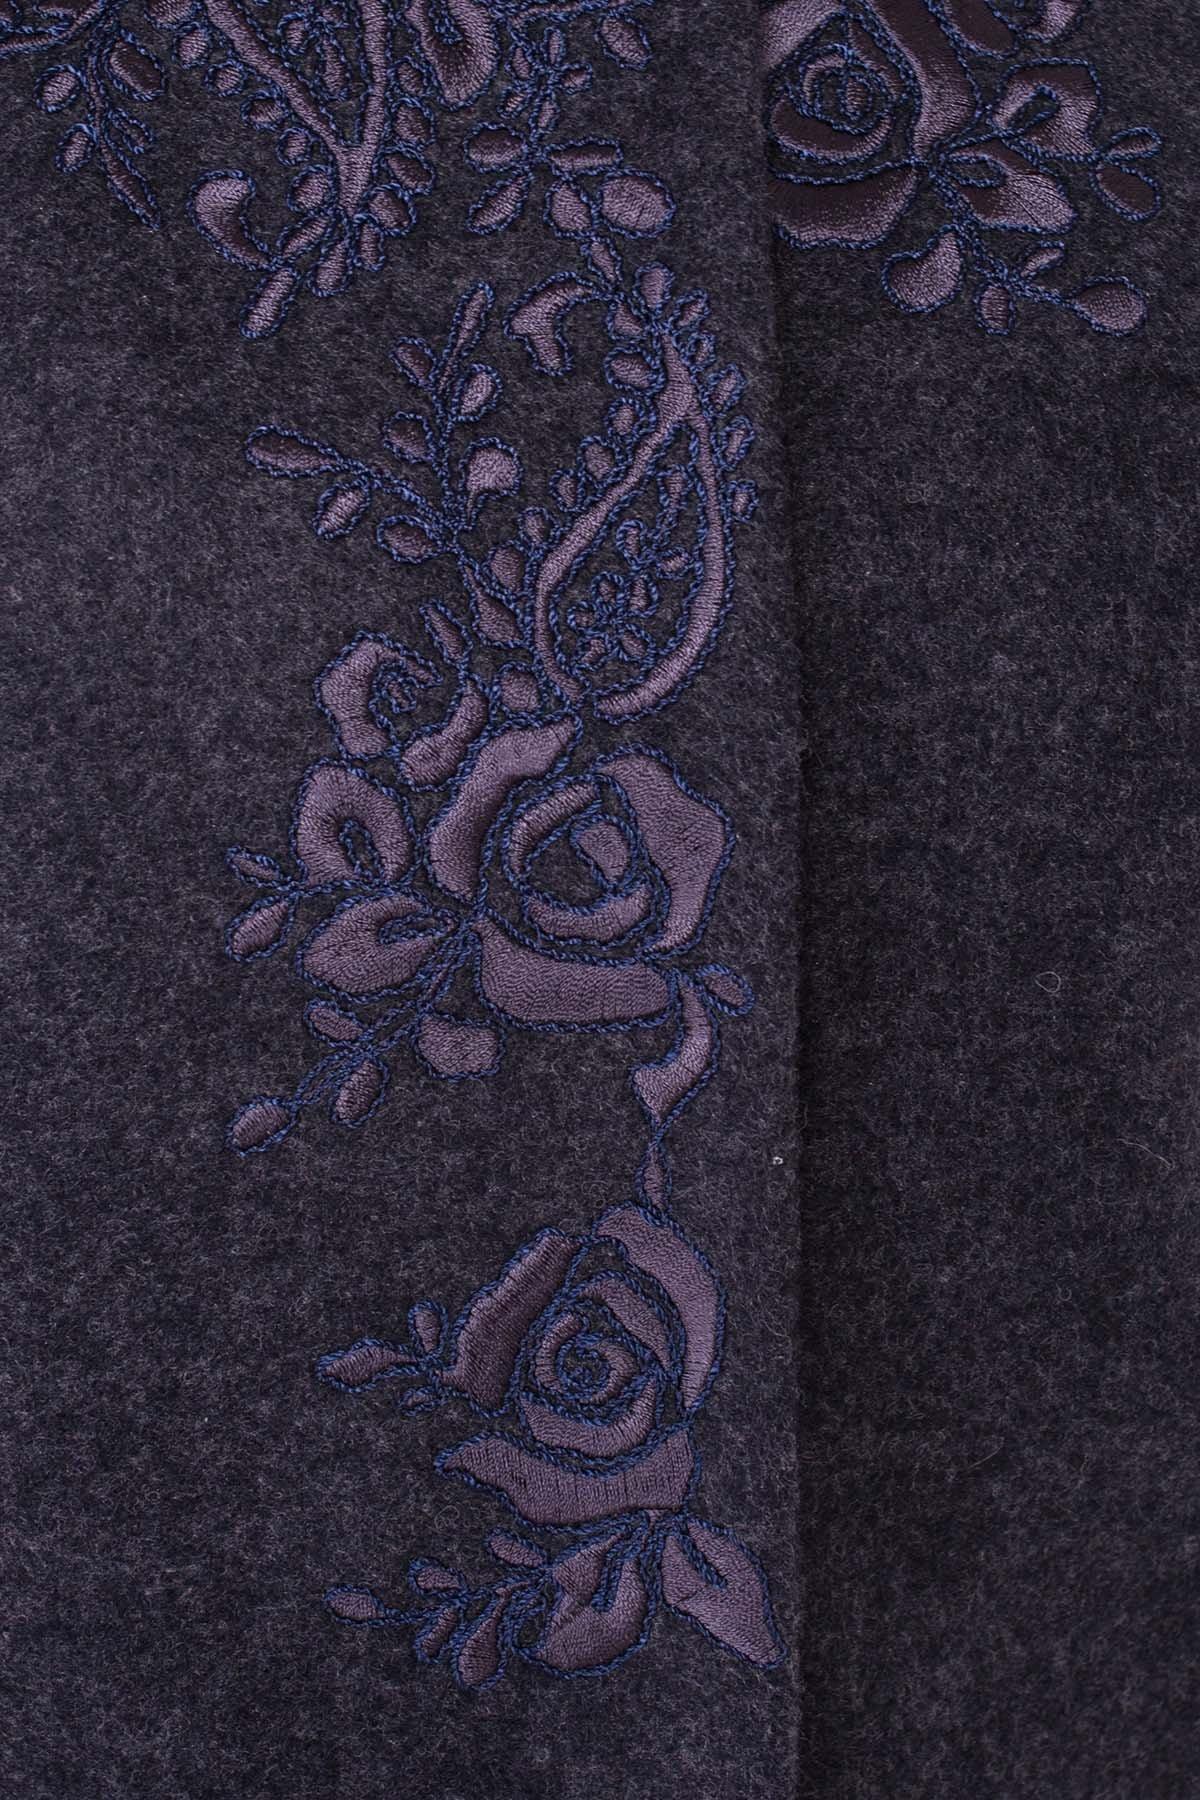 Пальто Авелони 4555 Цвет: Темно-синий